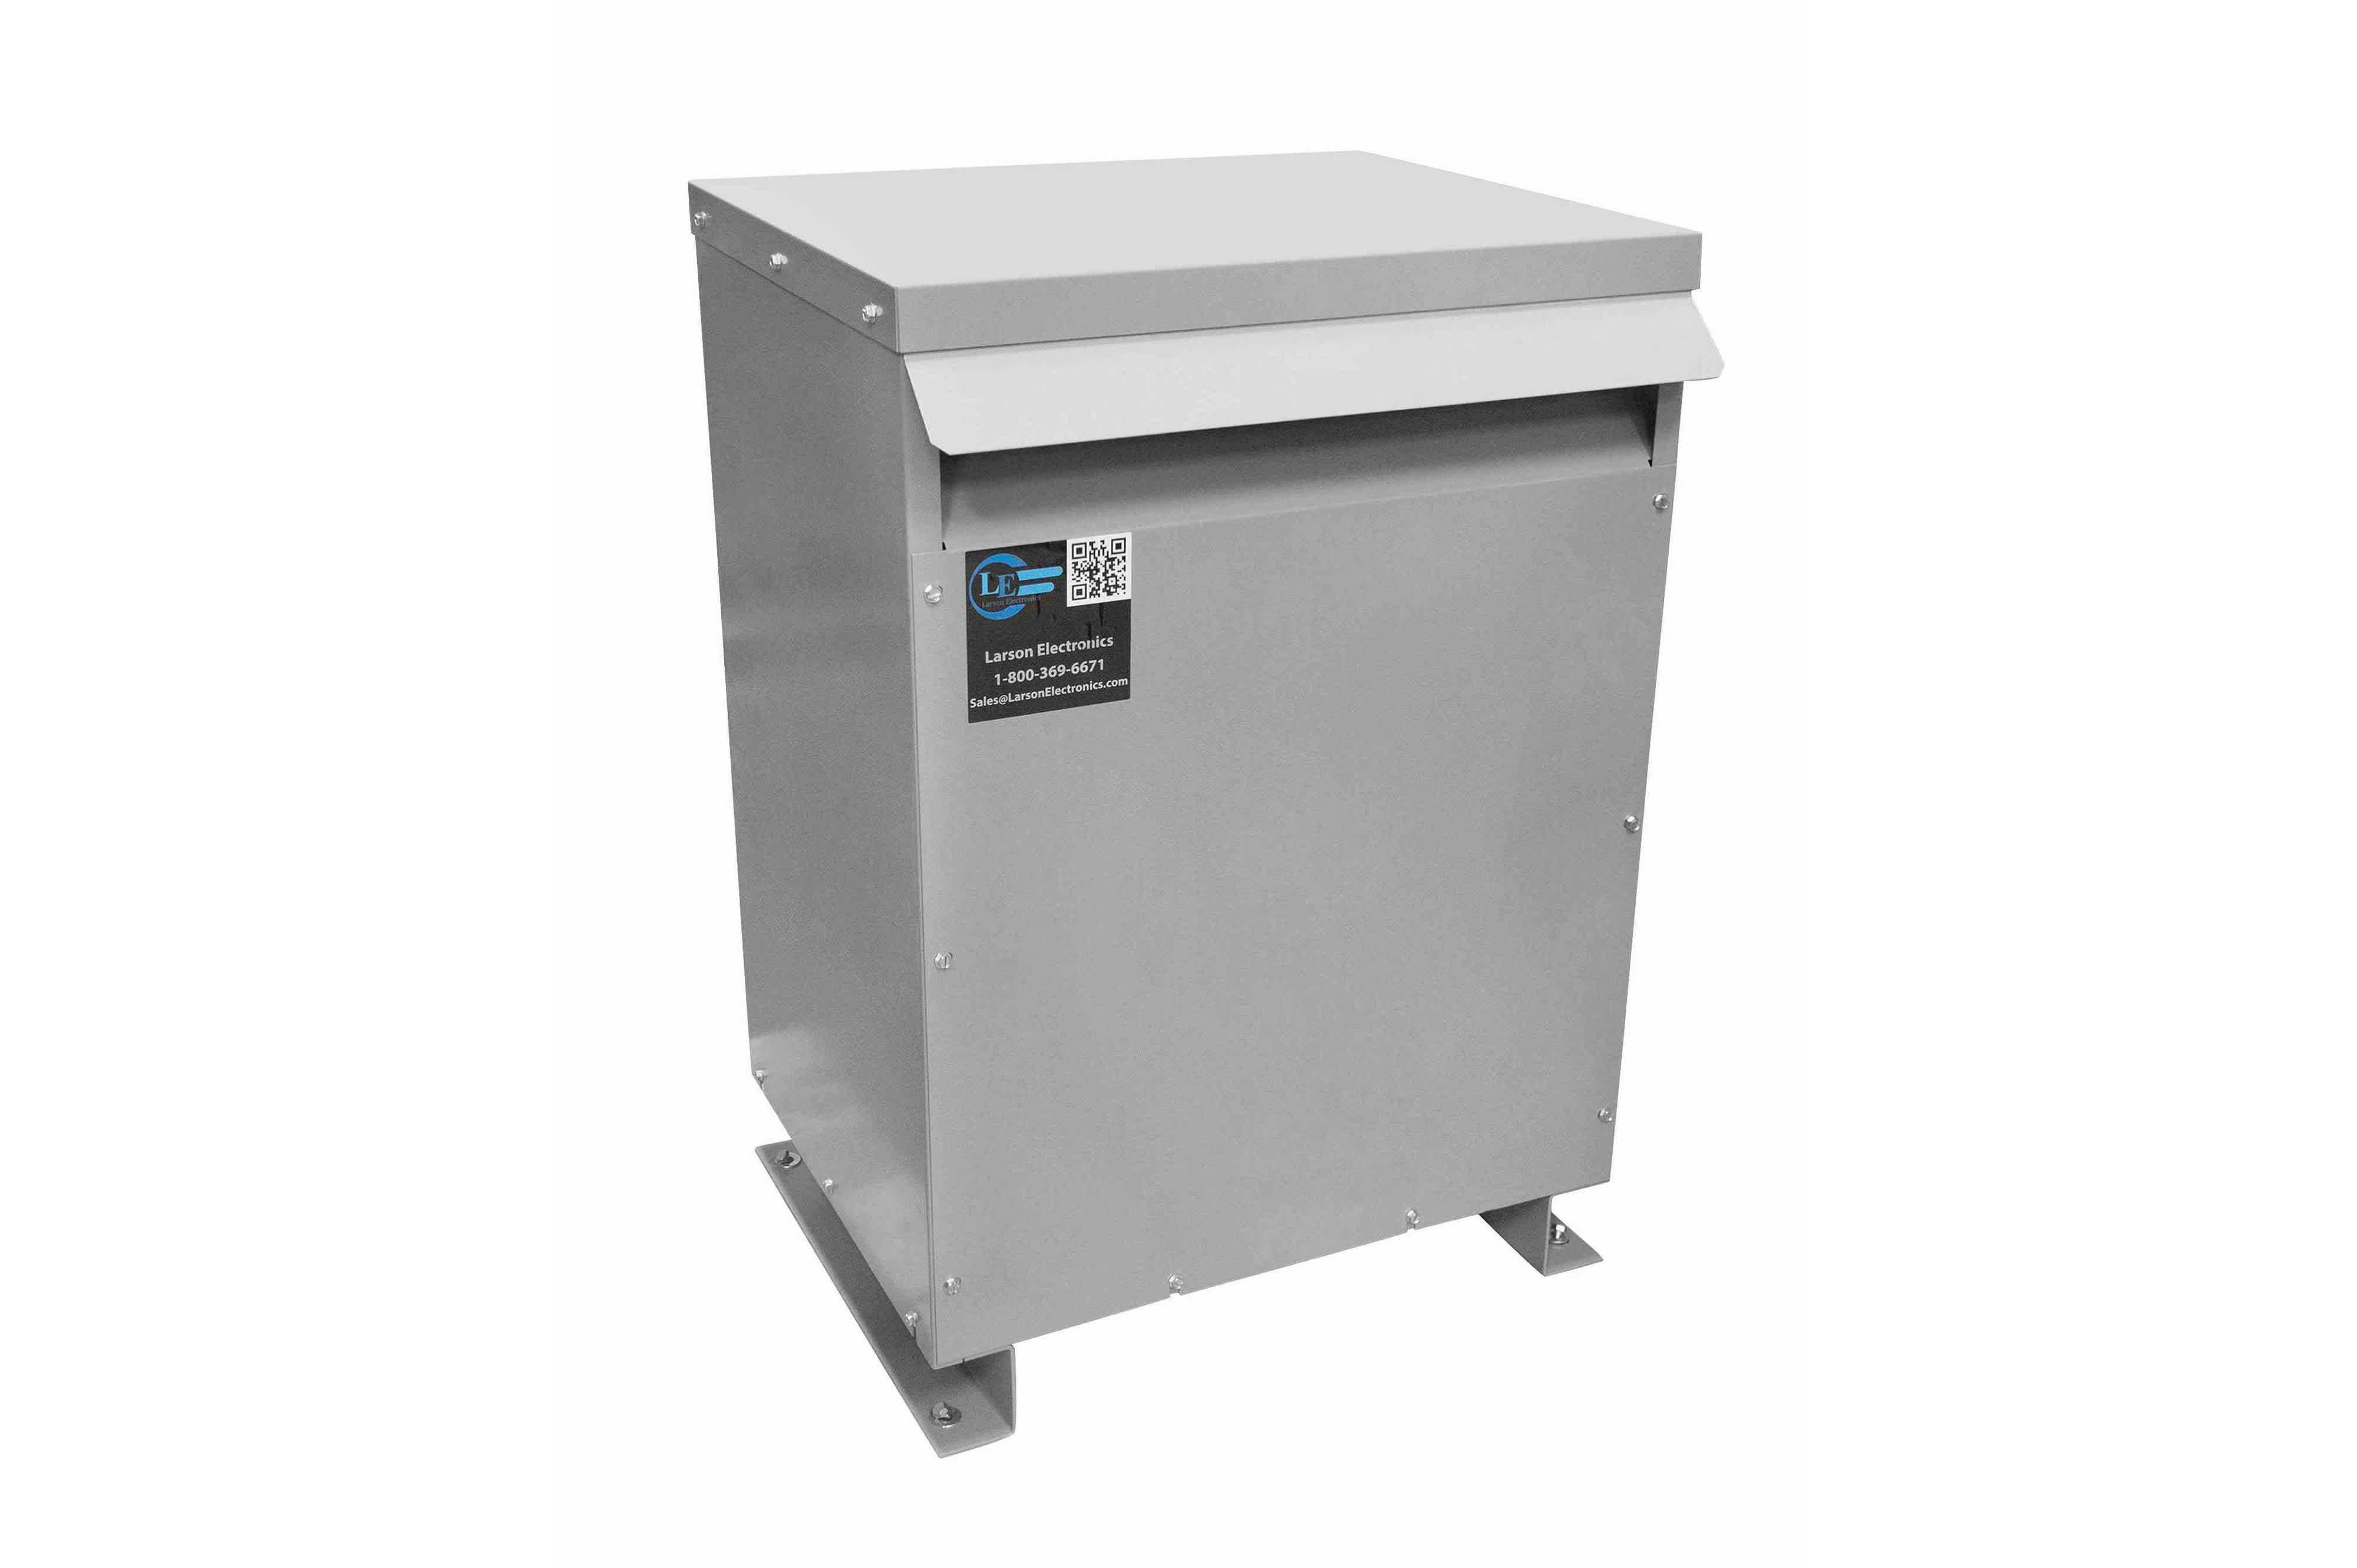 27 kVA 3PH Isolation Transformer, 240V Wye Primary, 415V Delta Secondary, N3R, Ventilated, 60 Hz